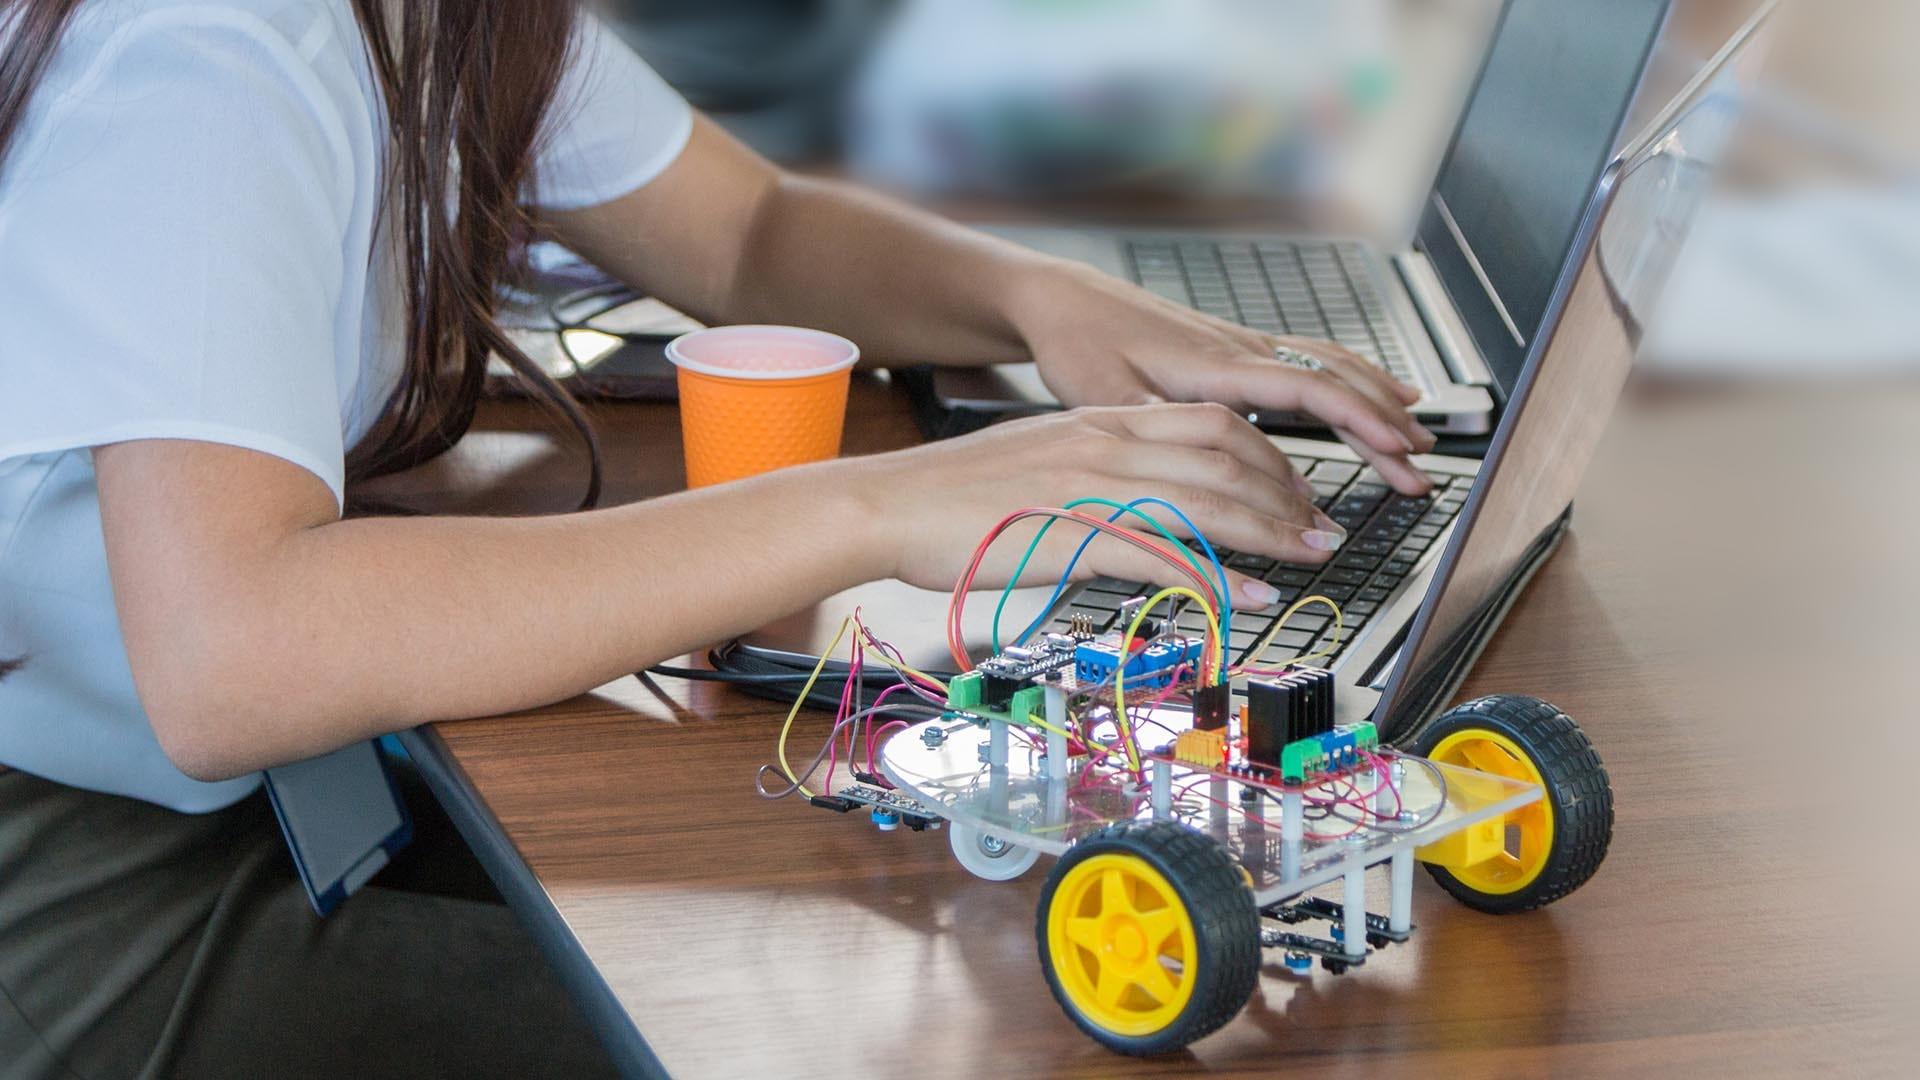 Girl programming a robot using a laptop